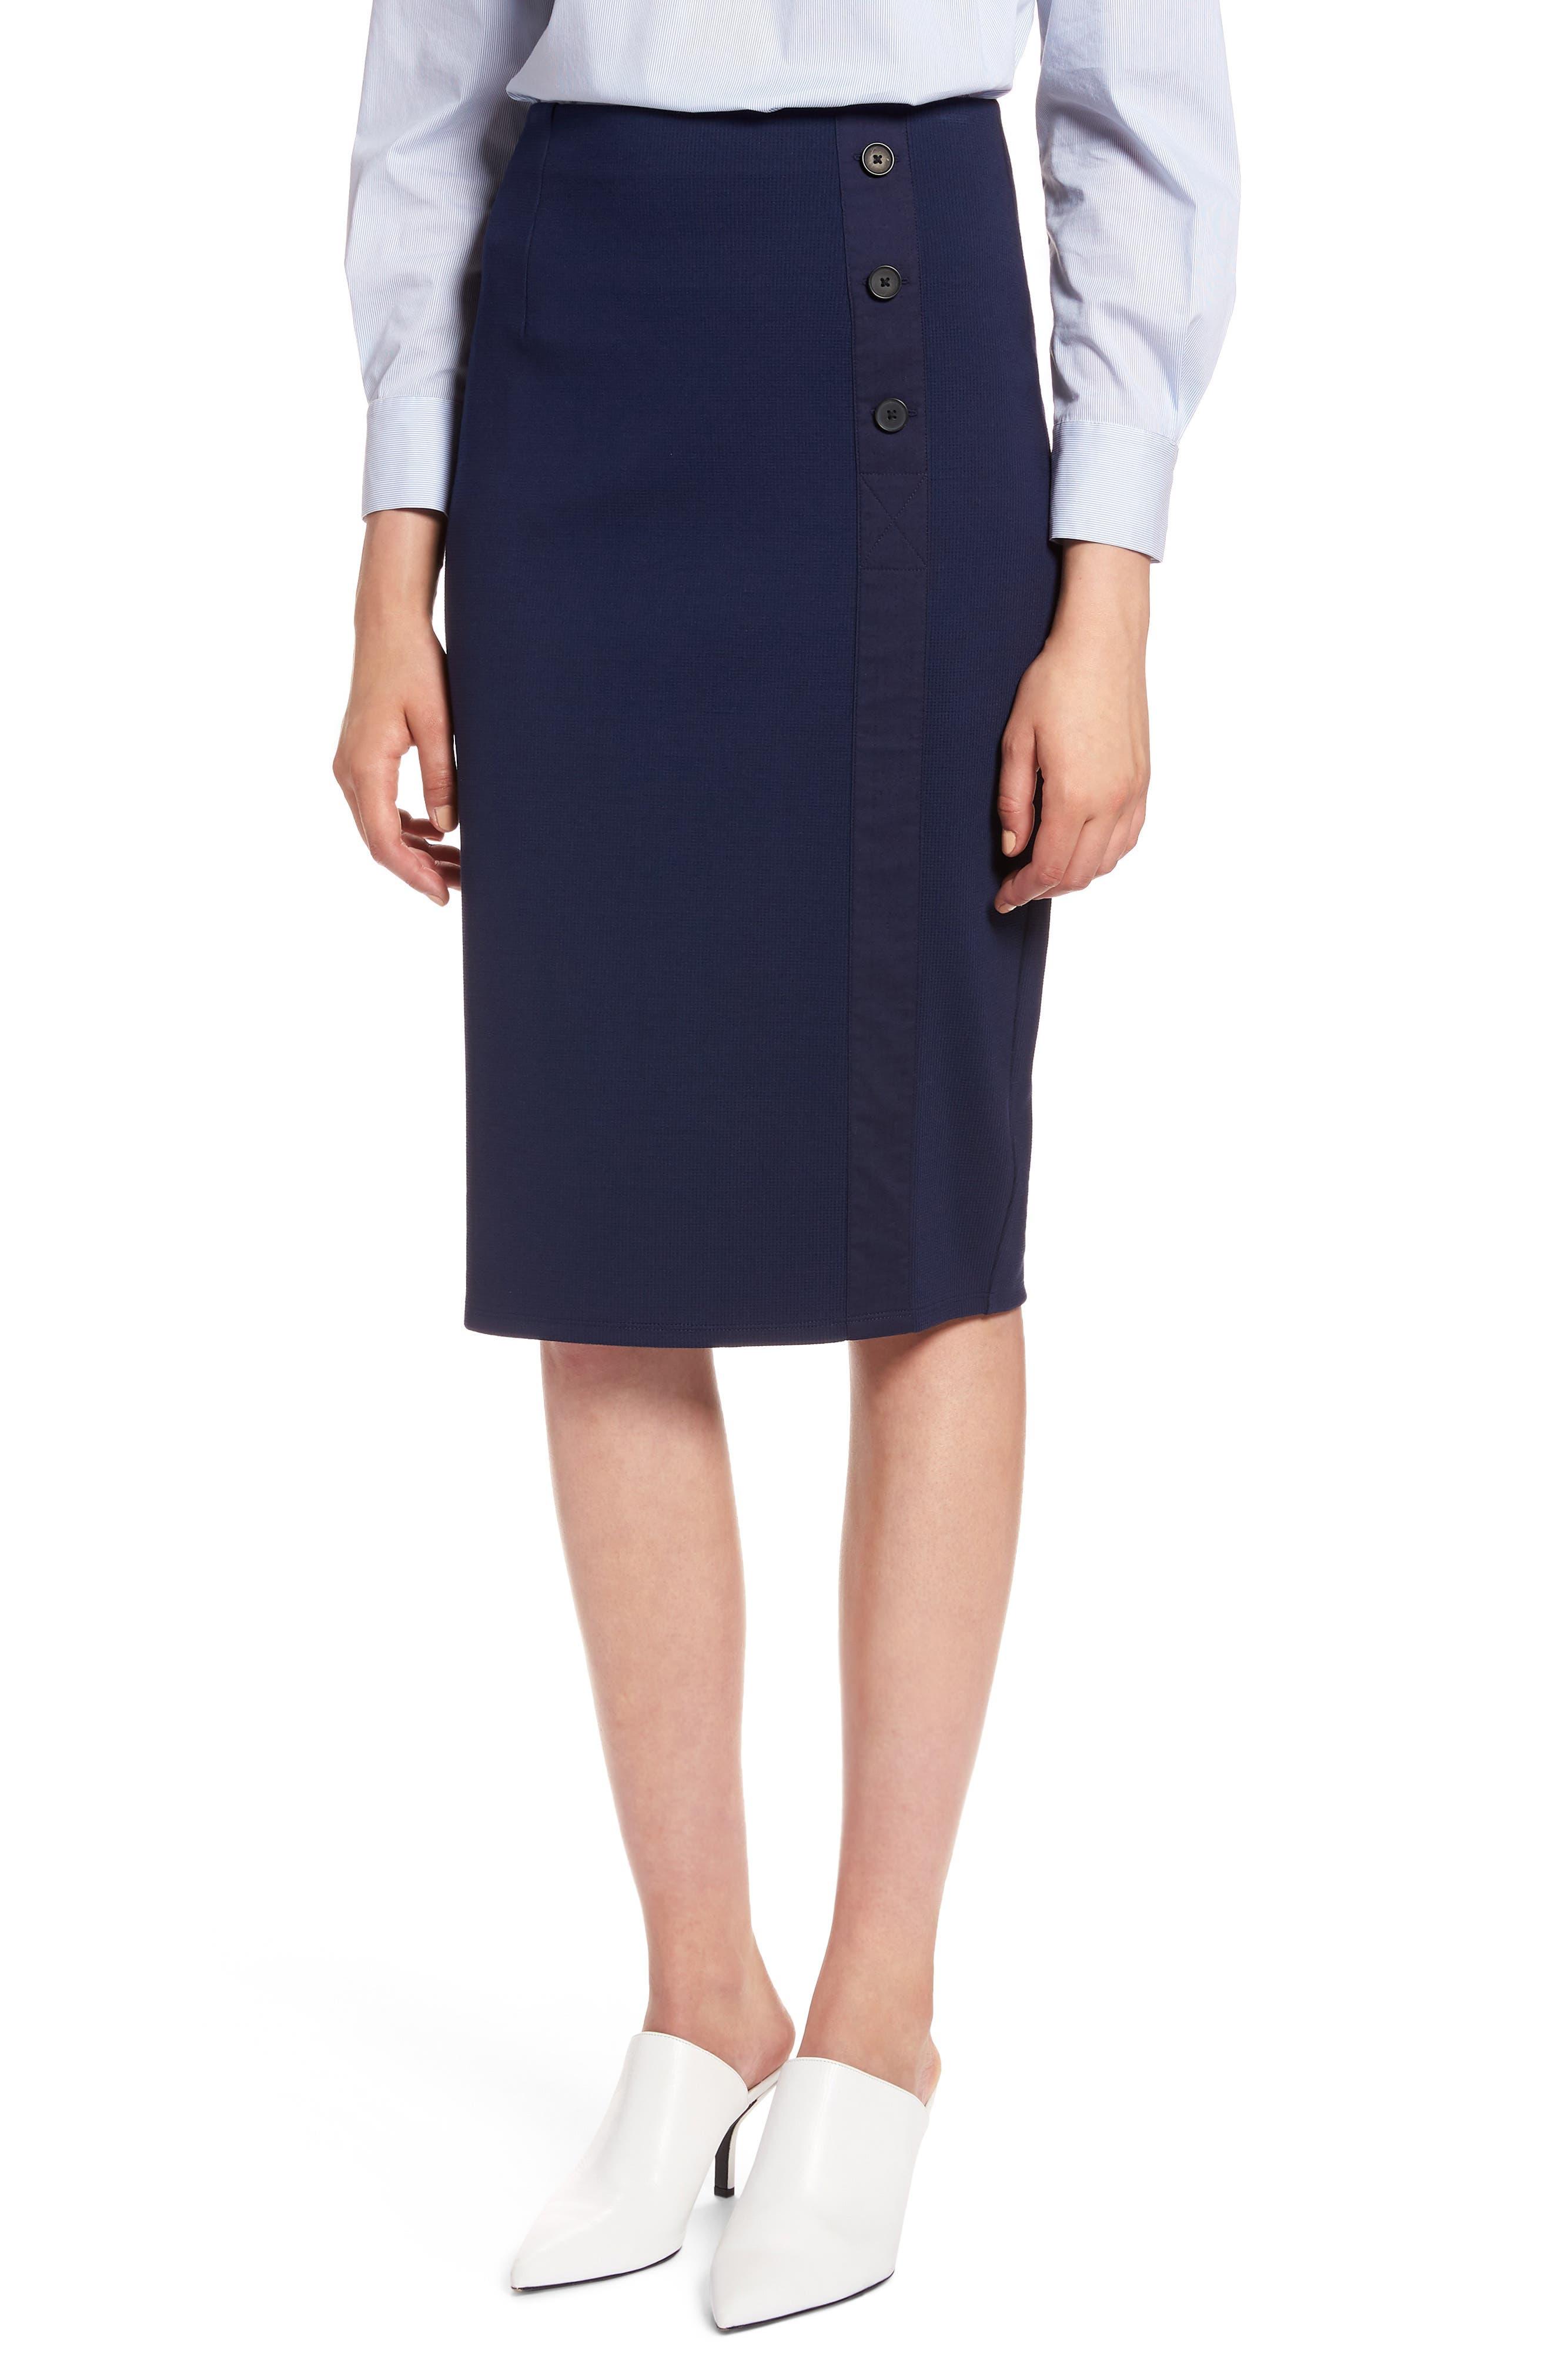 Petite Textured Ponte Pencil Skirt HALOGEN® $59 (Nordstrom)